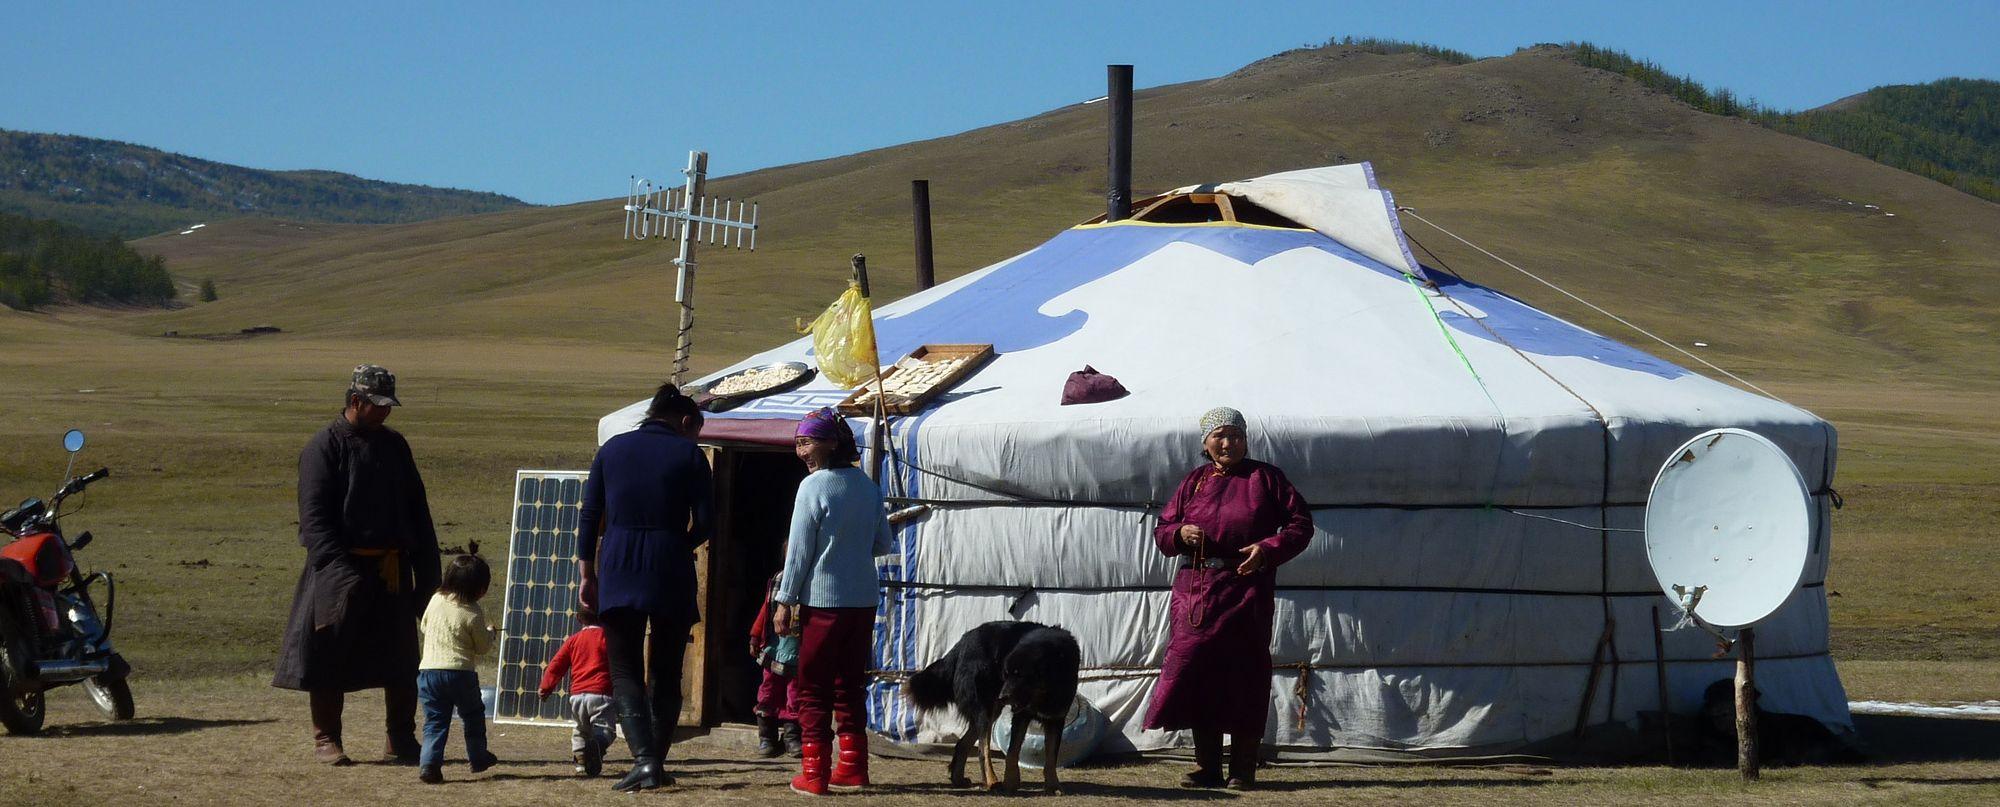 Mongolia - Desierto de Gobi, Estepa Central y Lago Khovsgol